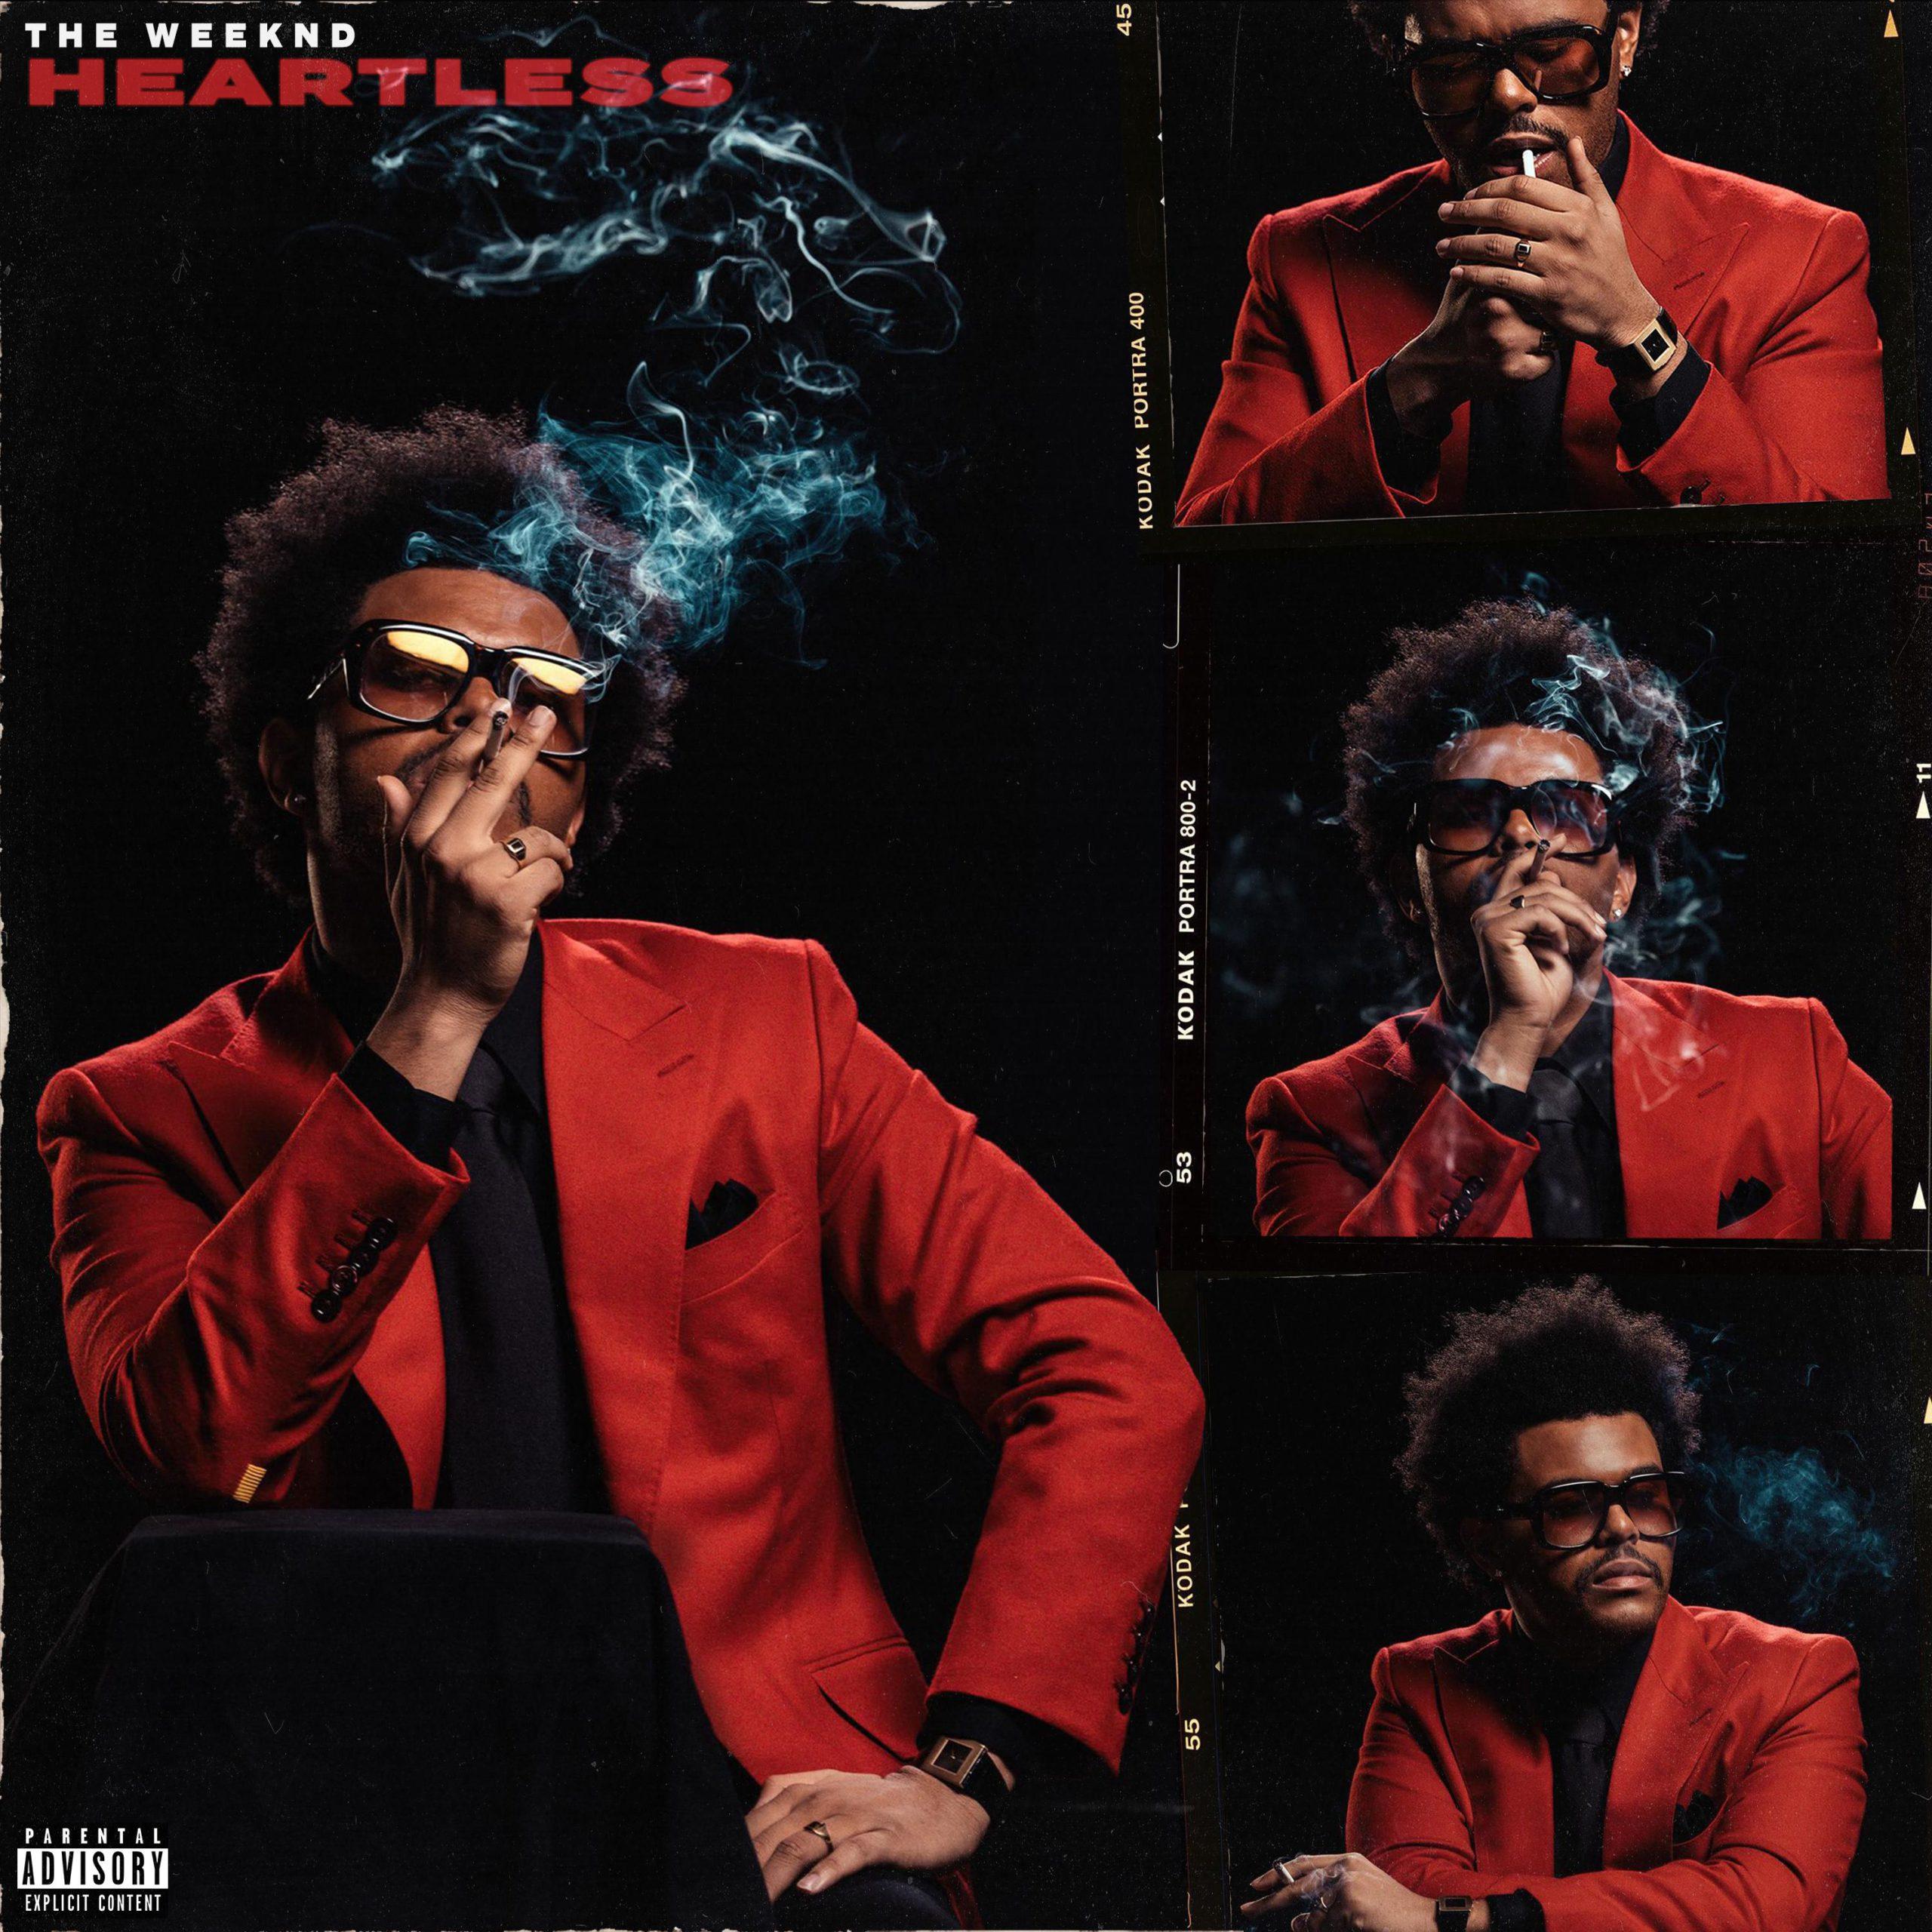 Ooh, I'm Blinded by the Lights: певец The Weeknd выпустил второй сингл за неделю